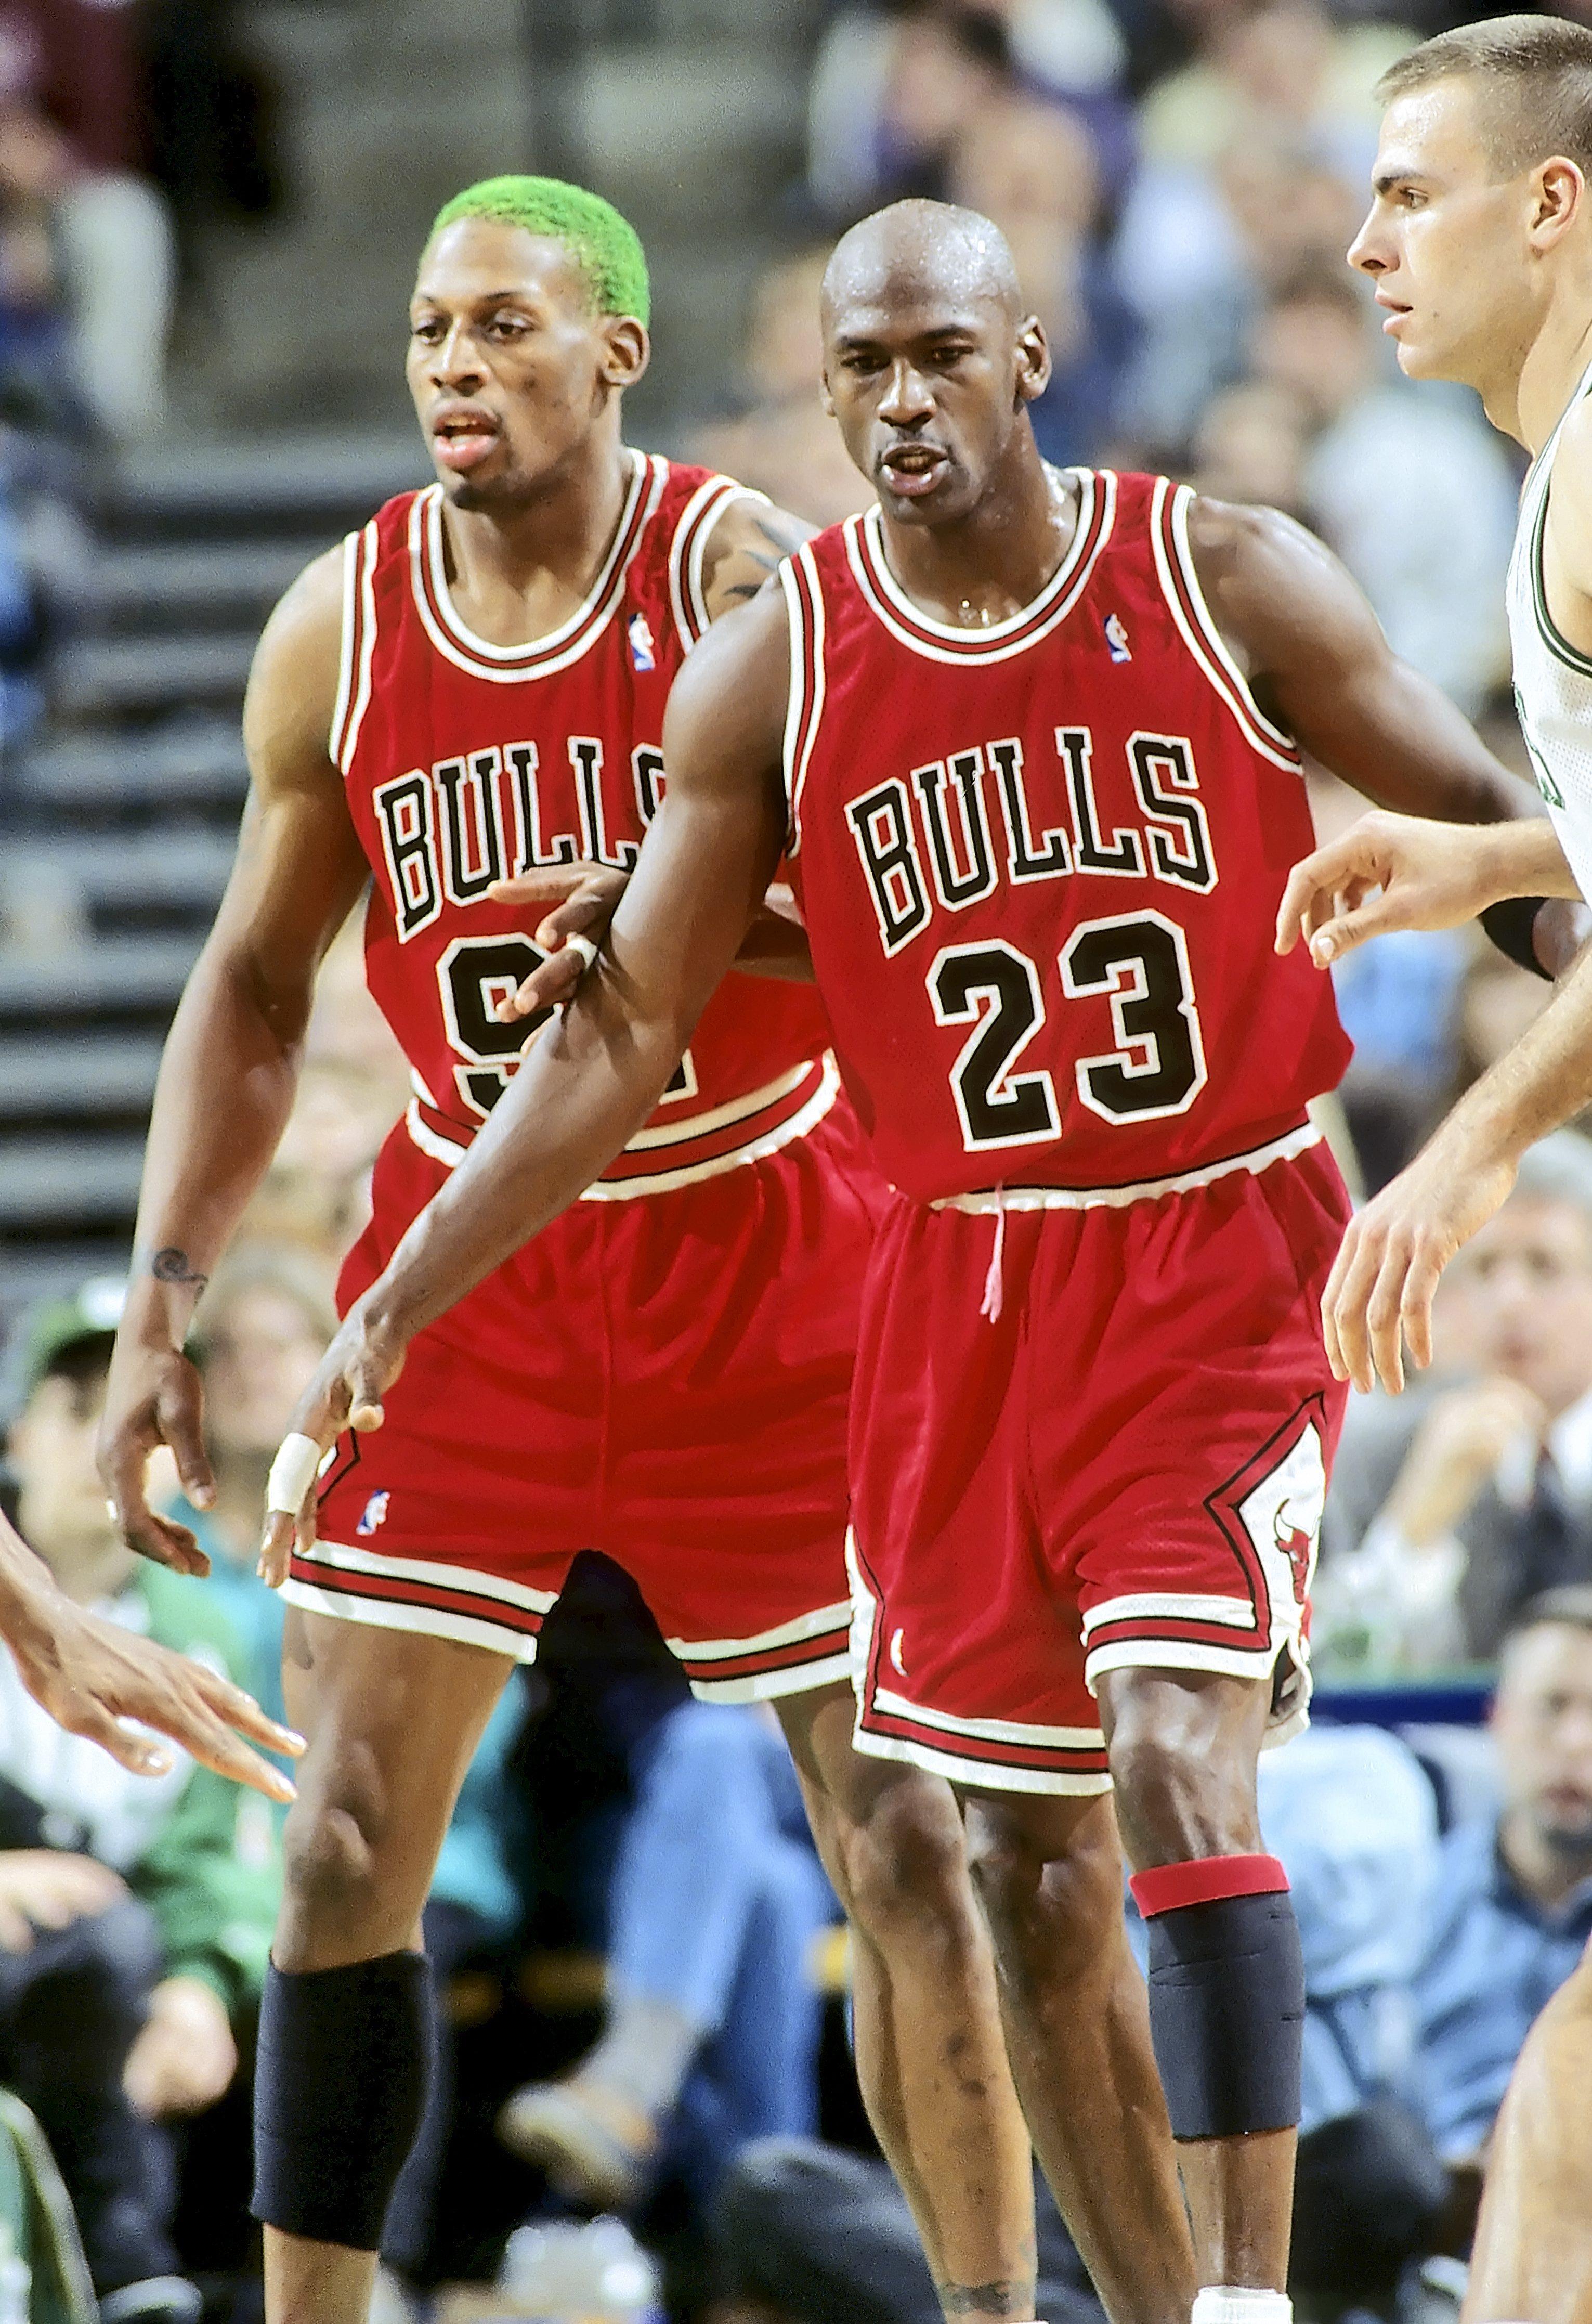 Деннис Родман (слева) и Майкл Джордан, 1996 год